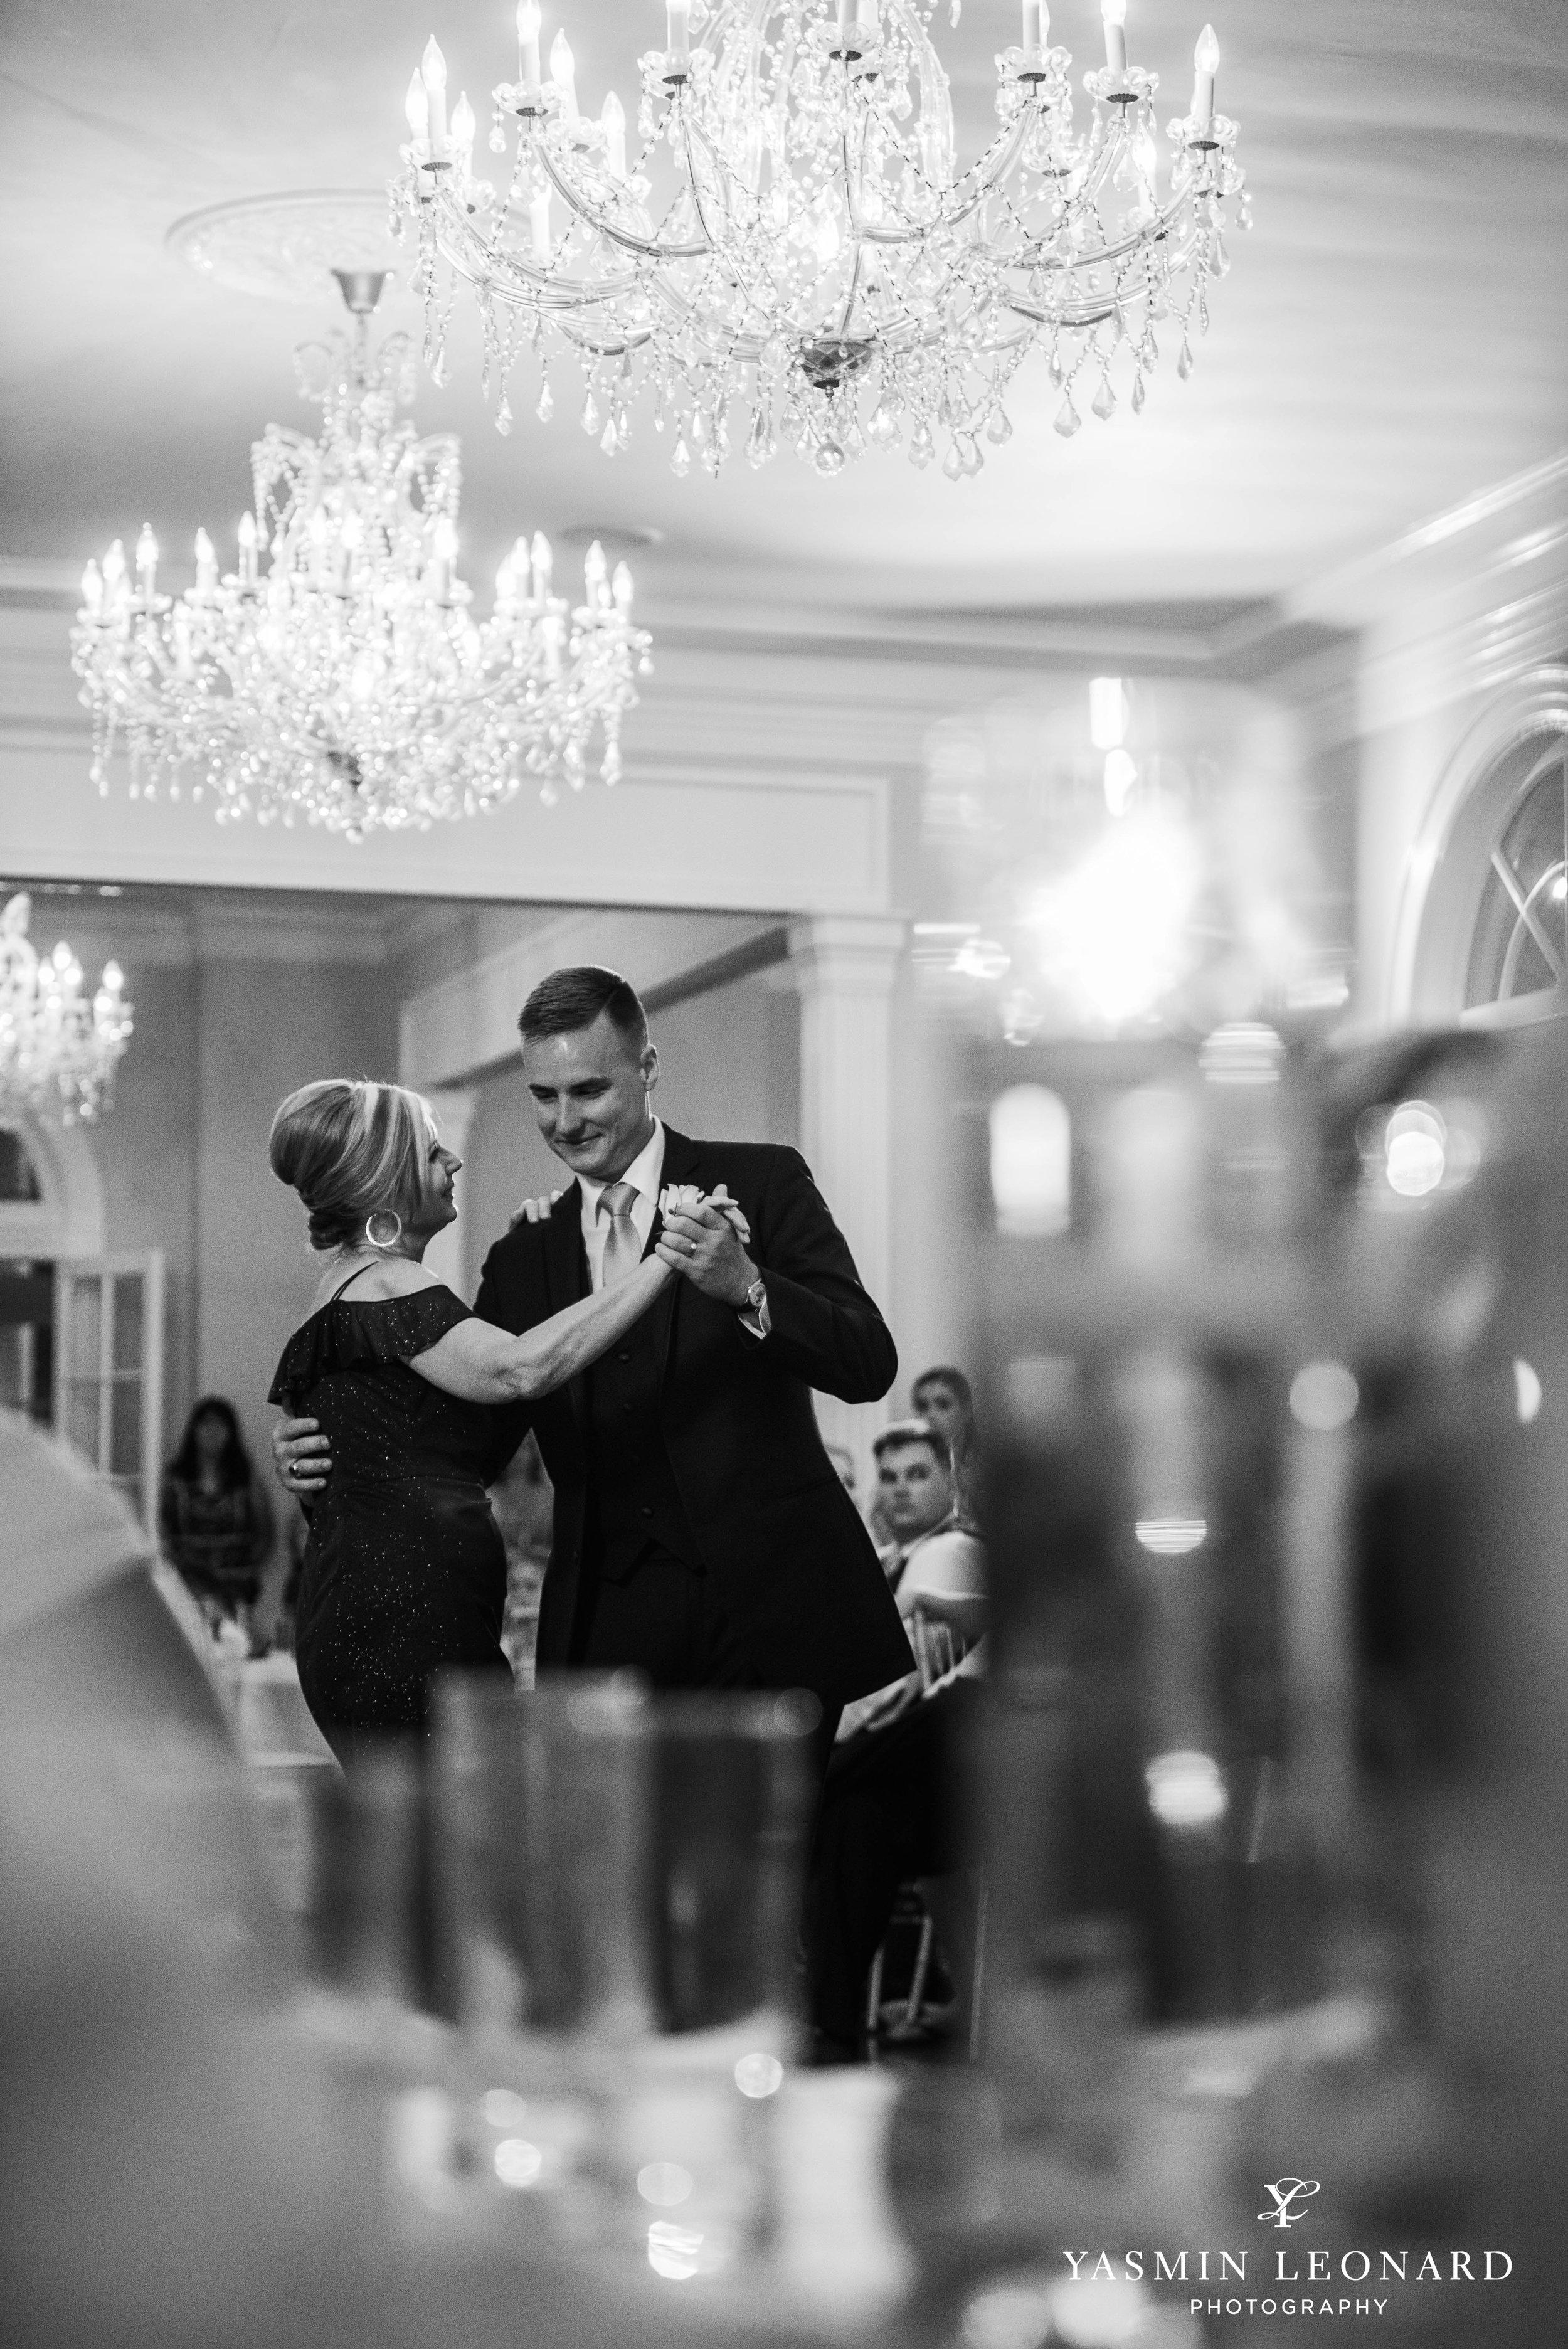 Separk Mansion - NC Weddings - Gastonia Wedding - NC Wedding Venues - Pink and Blue Wedding Ideas - Pink Bridesmaid Dresses - Yasmin Leonard Photography-55.jpg